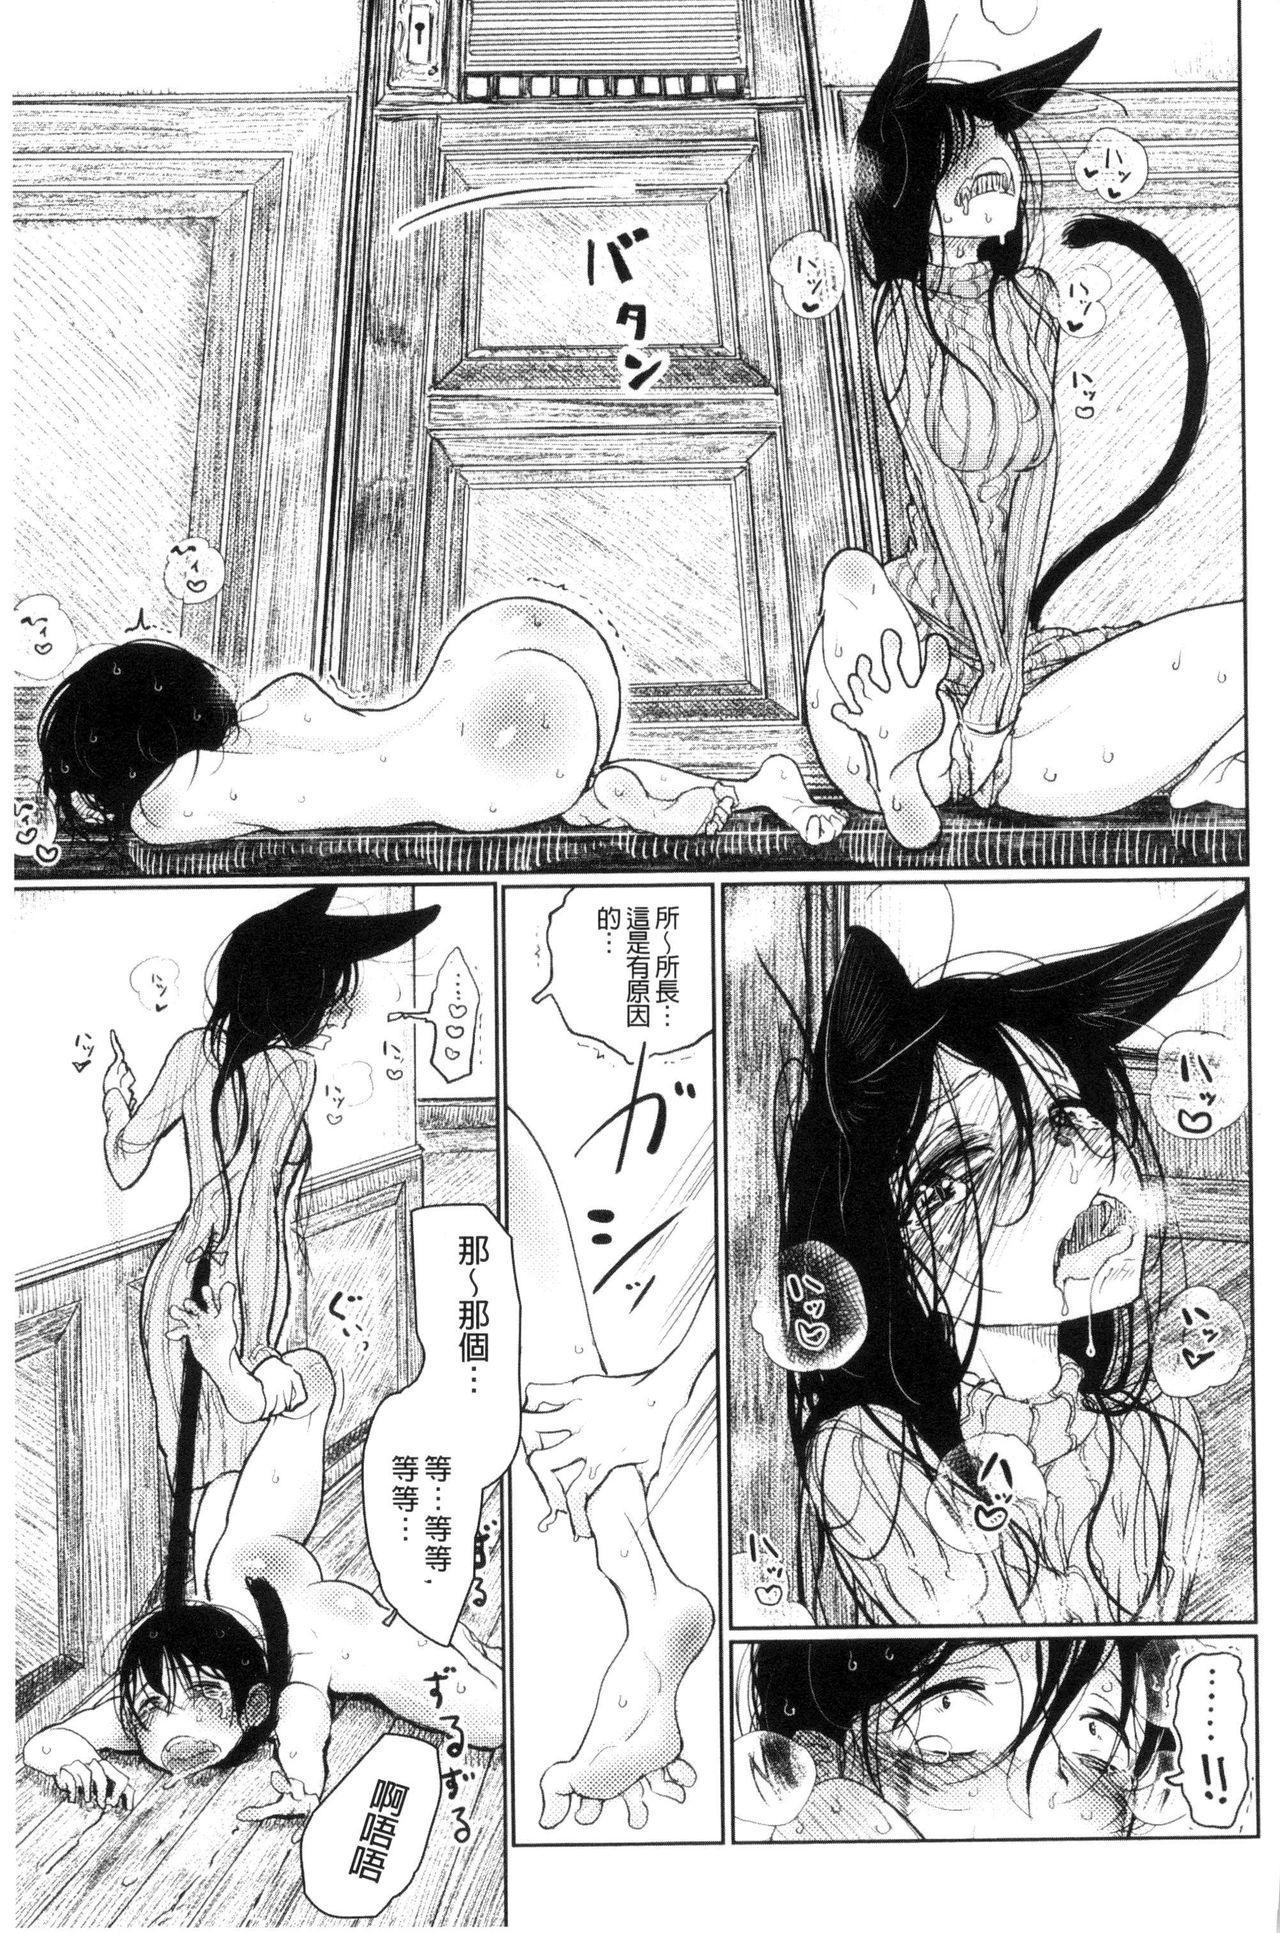 [Dhibi] Sono Yubisaki de Korogashite - Please Caress it at the Finger-tip. [Chinese] 40